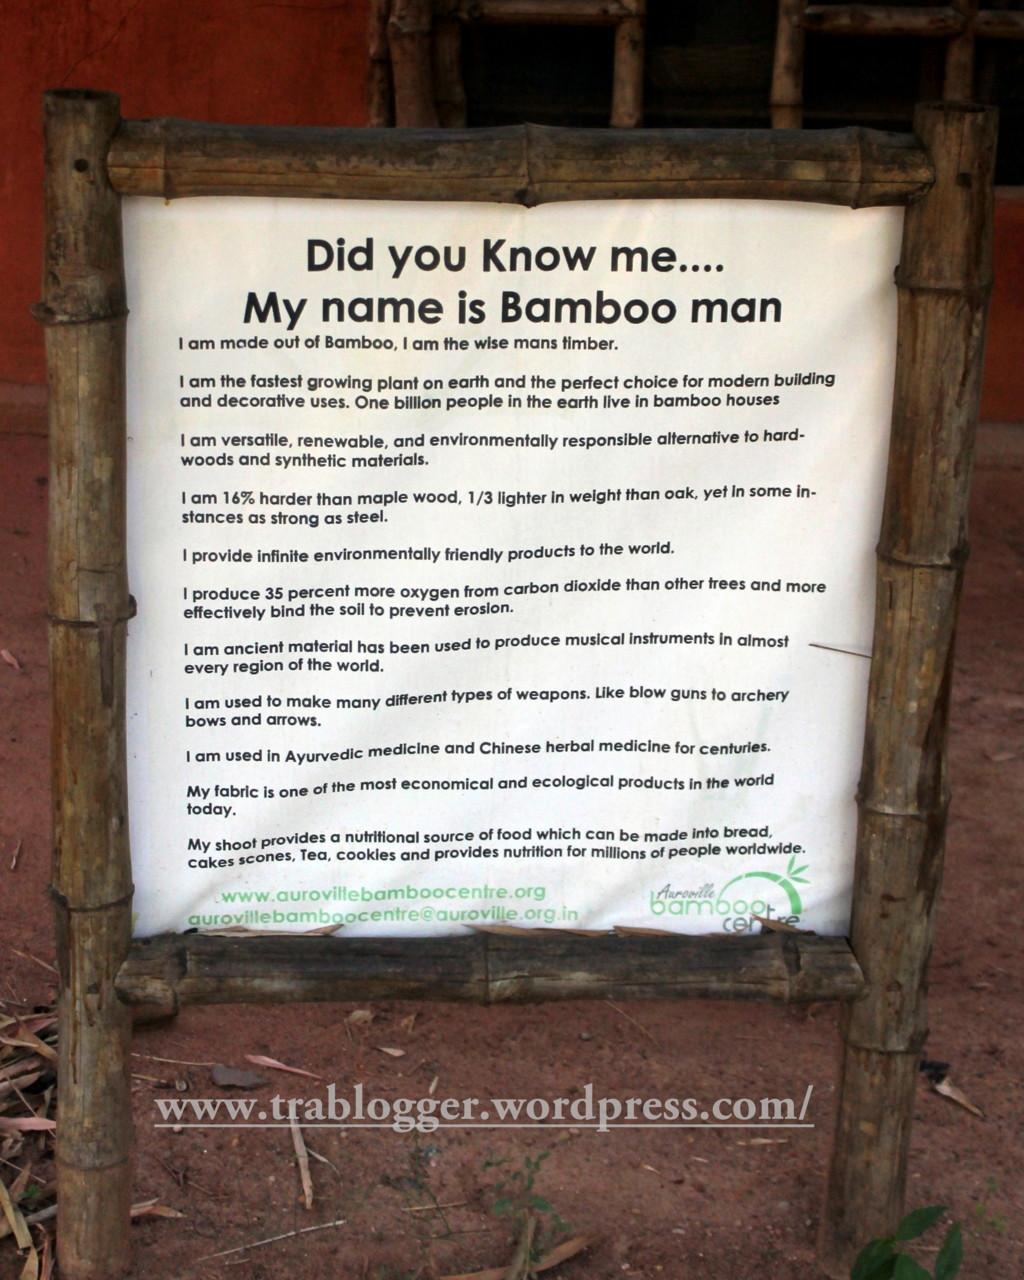 The Bamboo man